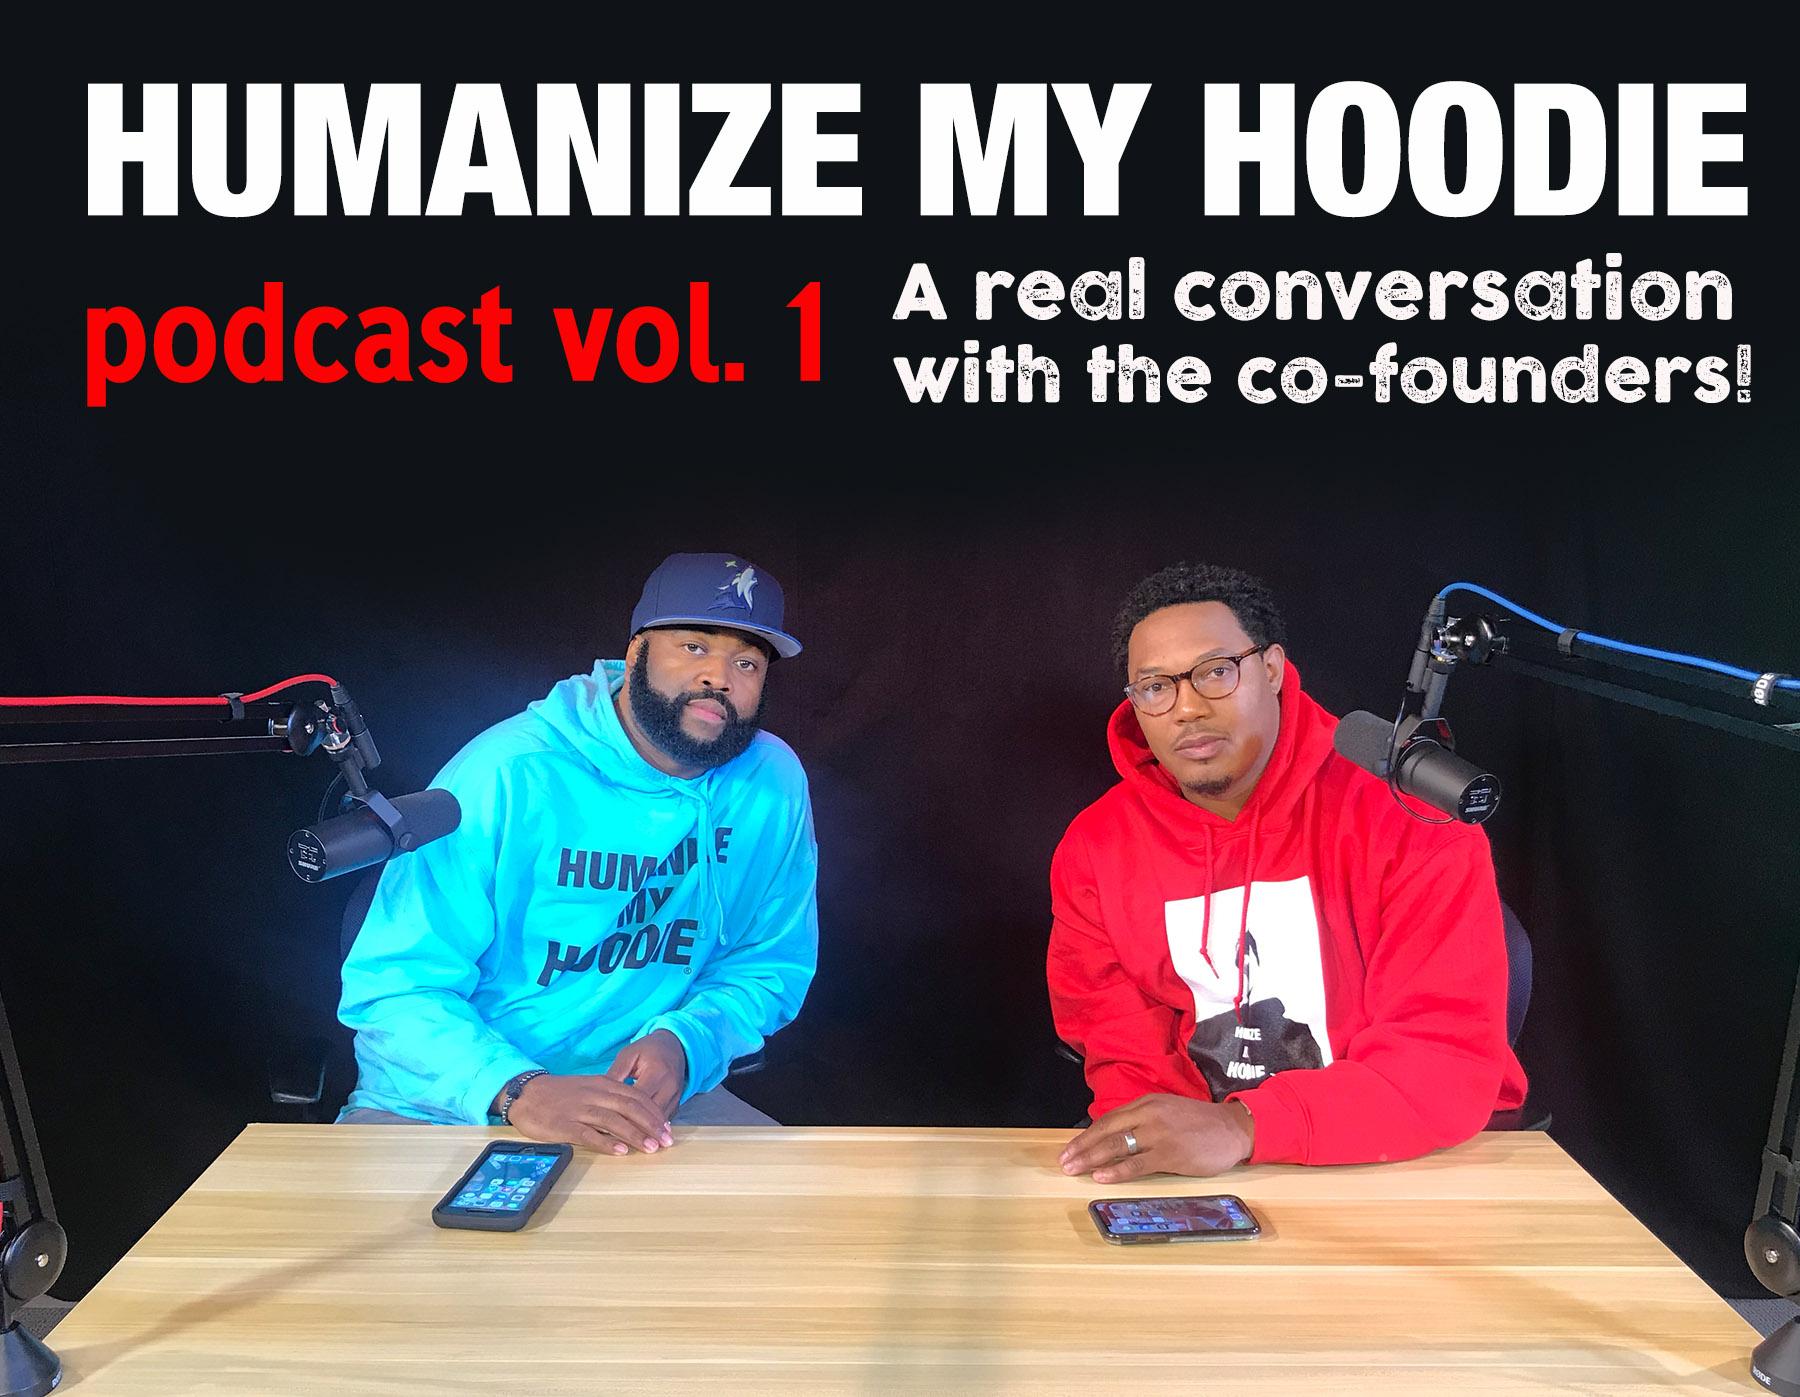 Humanize My Hoodie Podcast.jpg